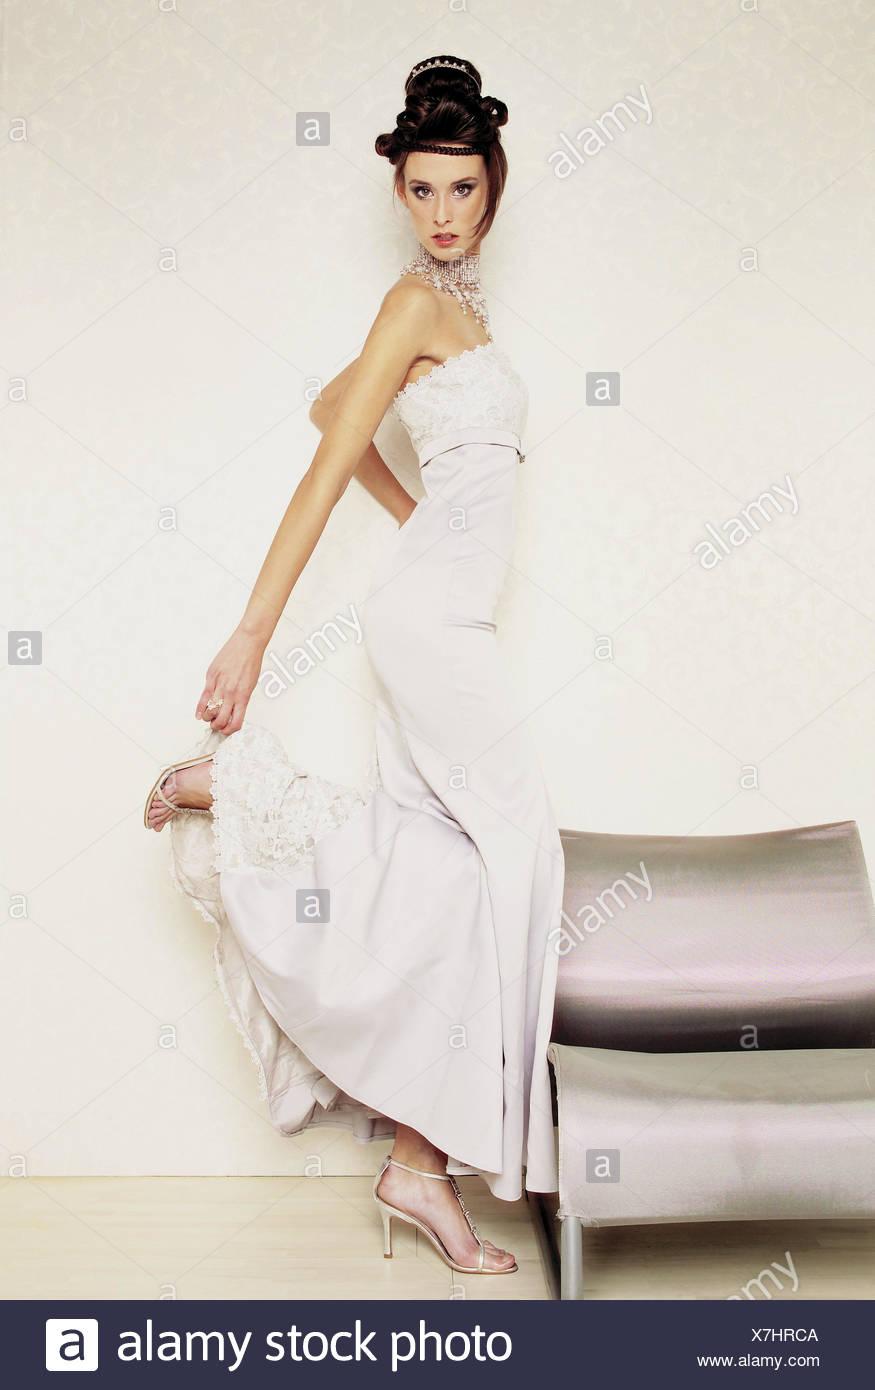 Dark Wedding Dress Stockfotos & Dark Wedding Dress Bilder - Alamy